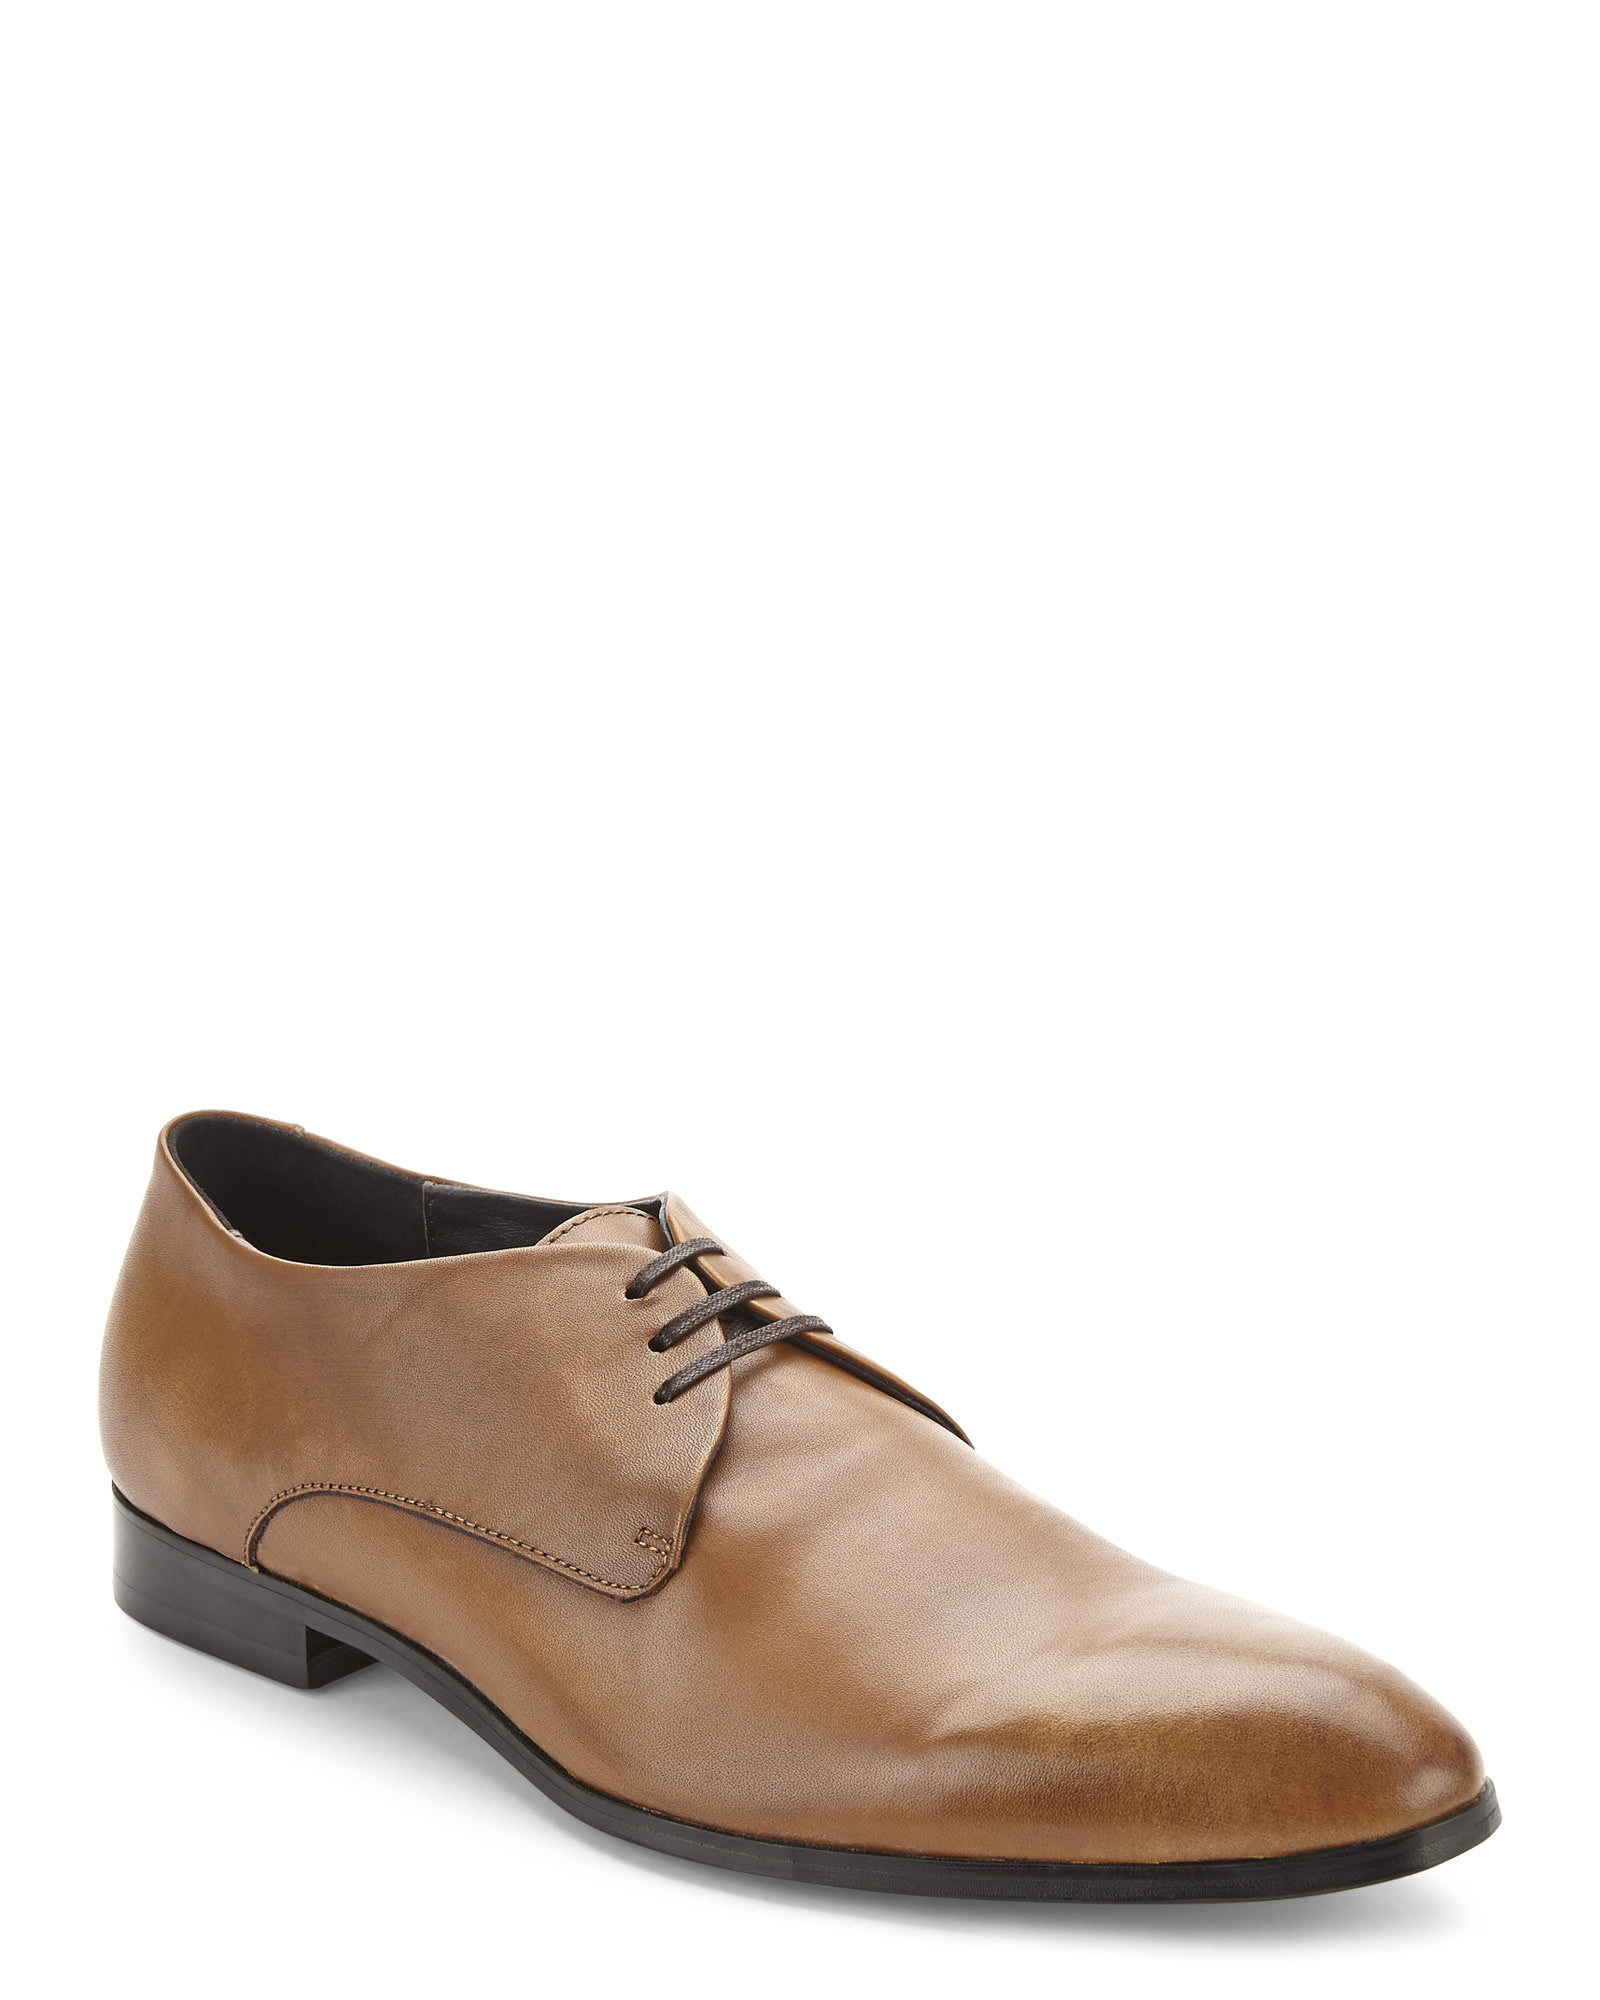 Bacco Bucci Mens Cahill Black Leather Oxford